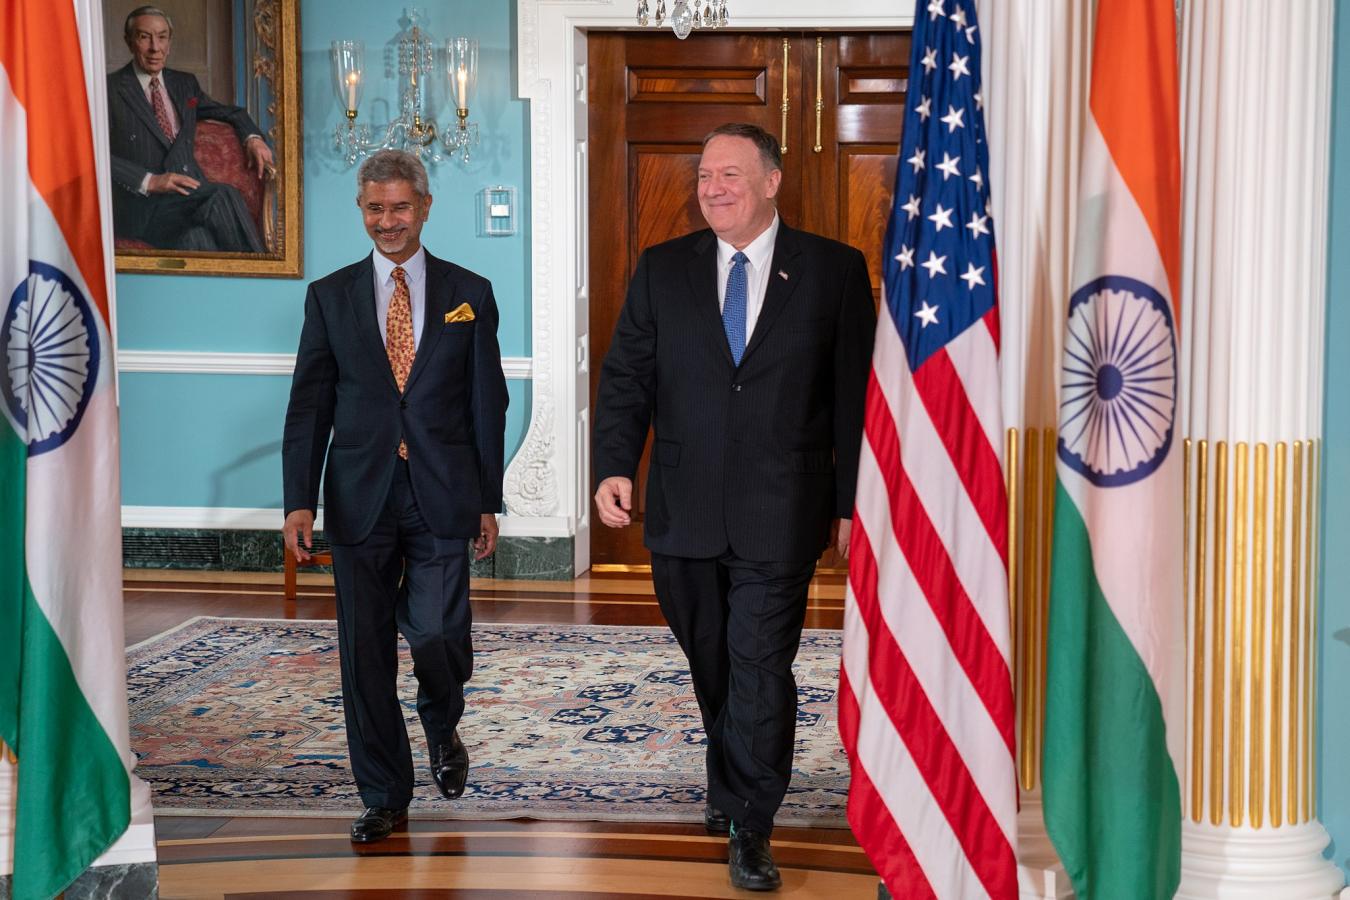 US Secretary of State Michael R. Pompeo and Indian Minister of External Affairs Subrahmanyam Jaishankar 30 September 2019